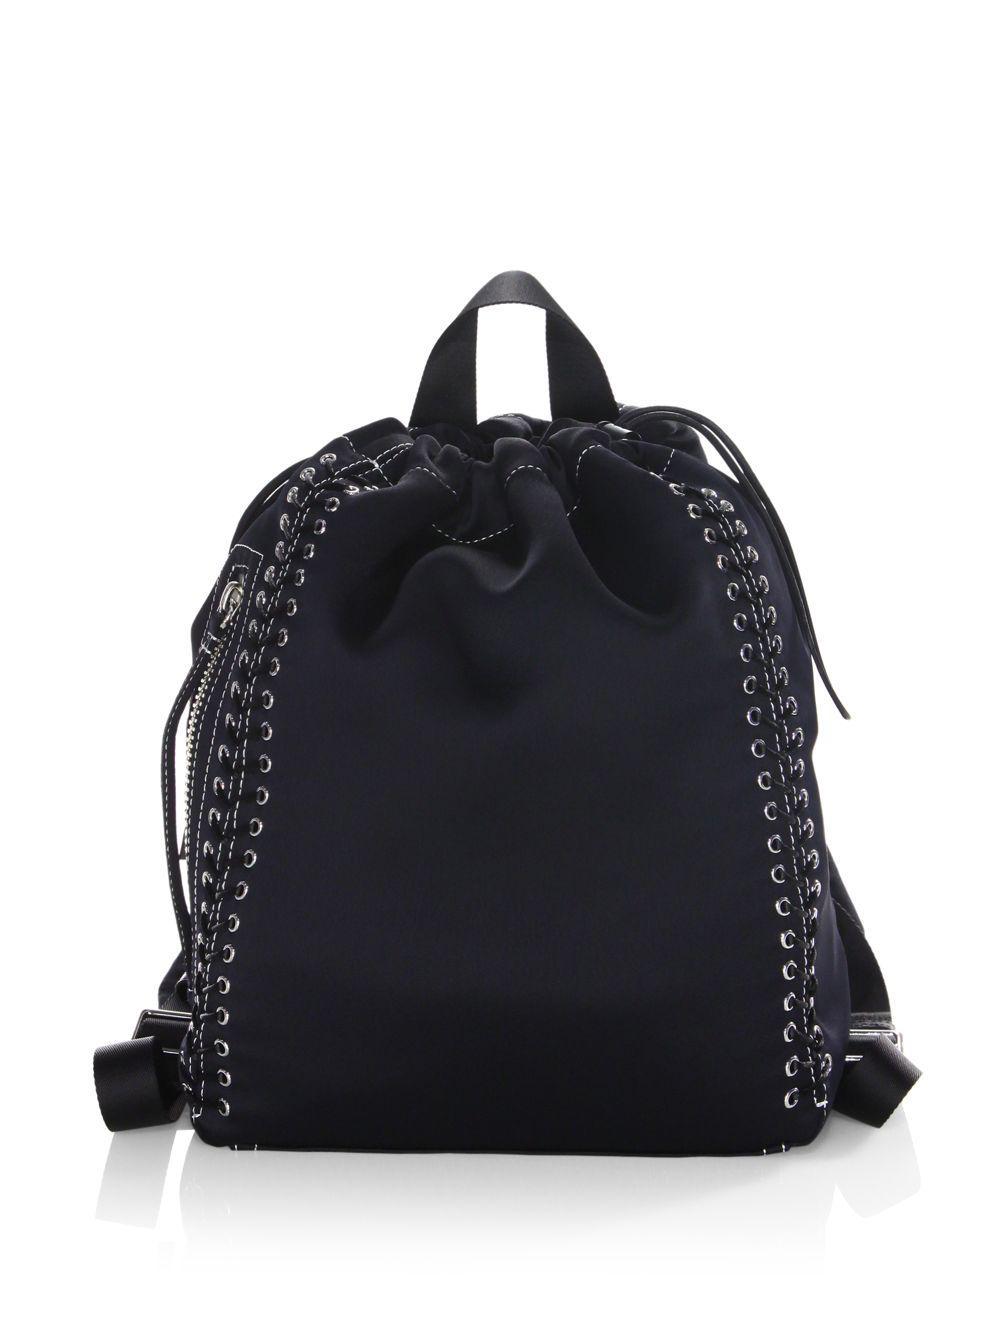 3.1 Phillip Lim Woman Go-go Embellished Shell Backpack Midnight Blue Size 3.1 Phillip Lim YMDORHHl